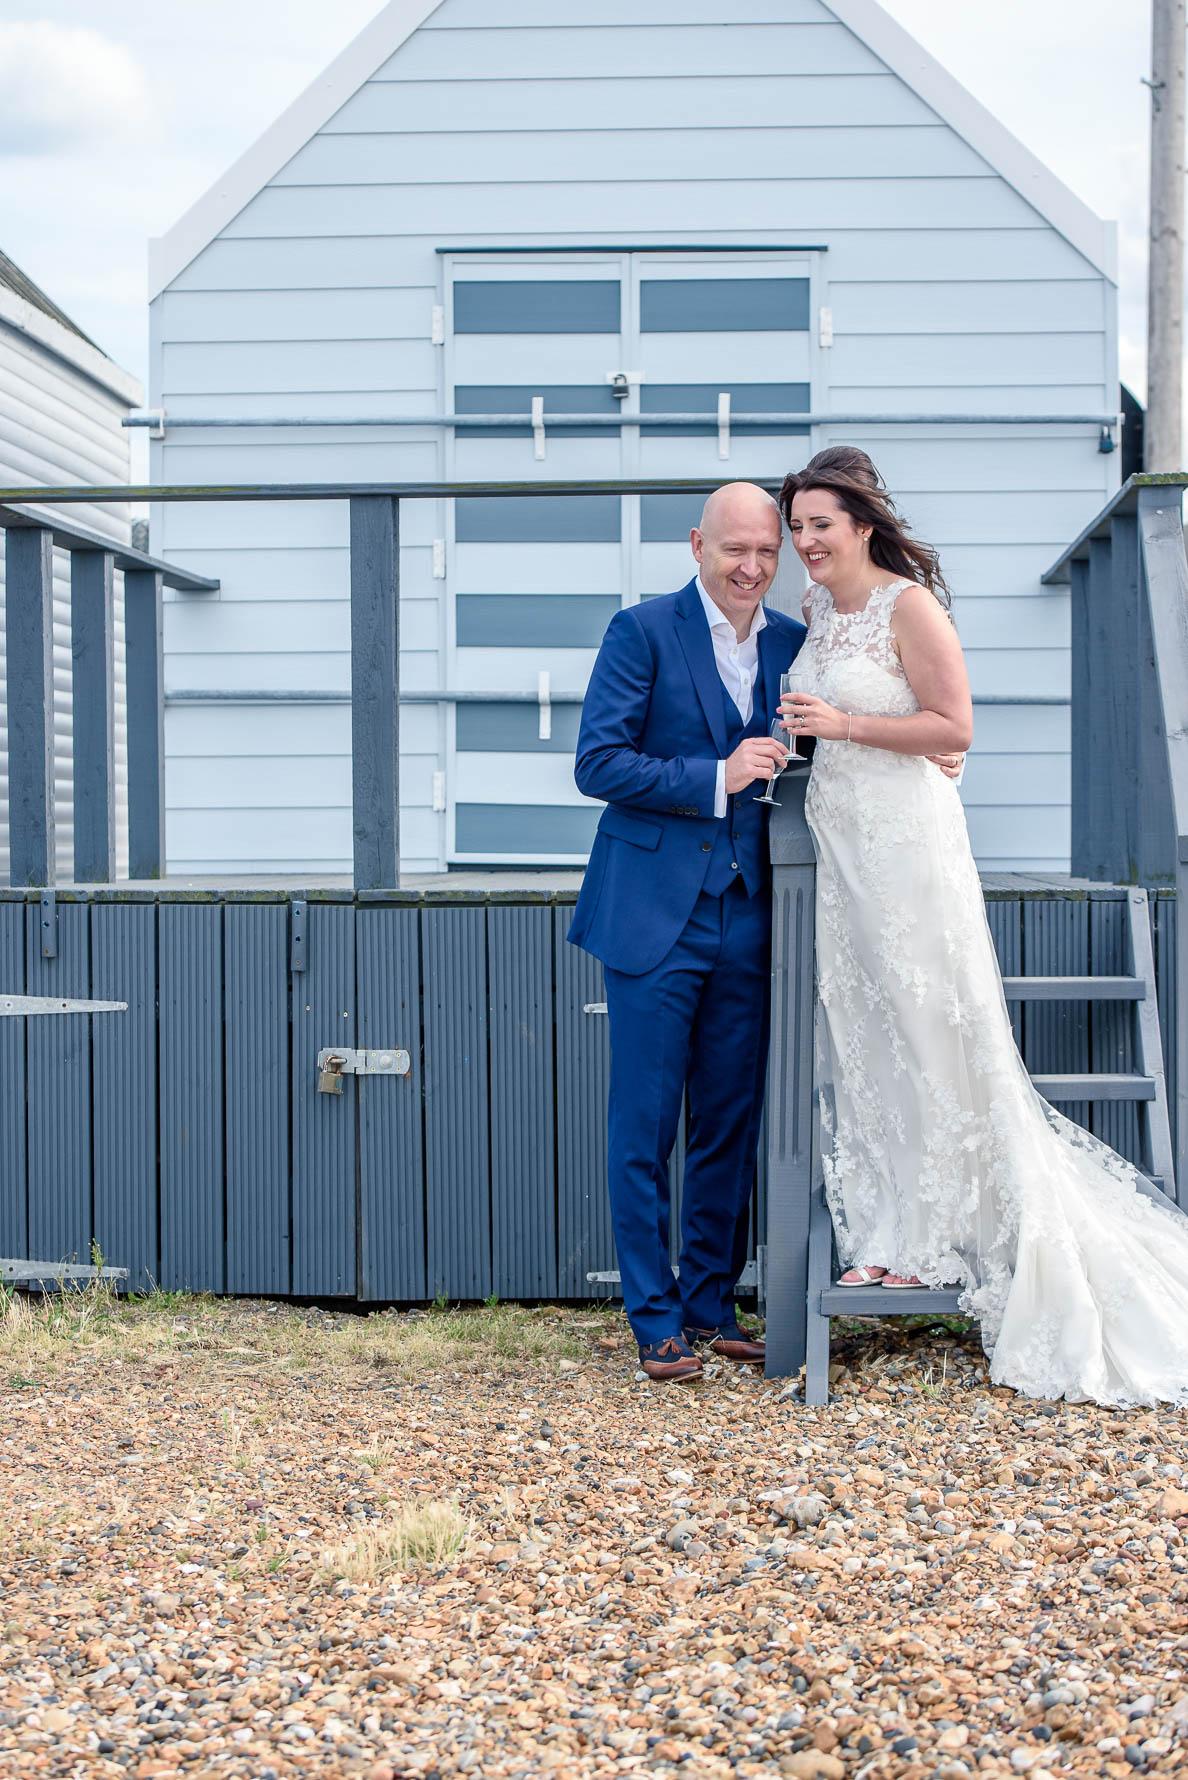 Wedding Photography at East Quay Venue-56.jpg